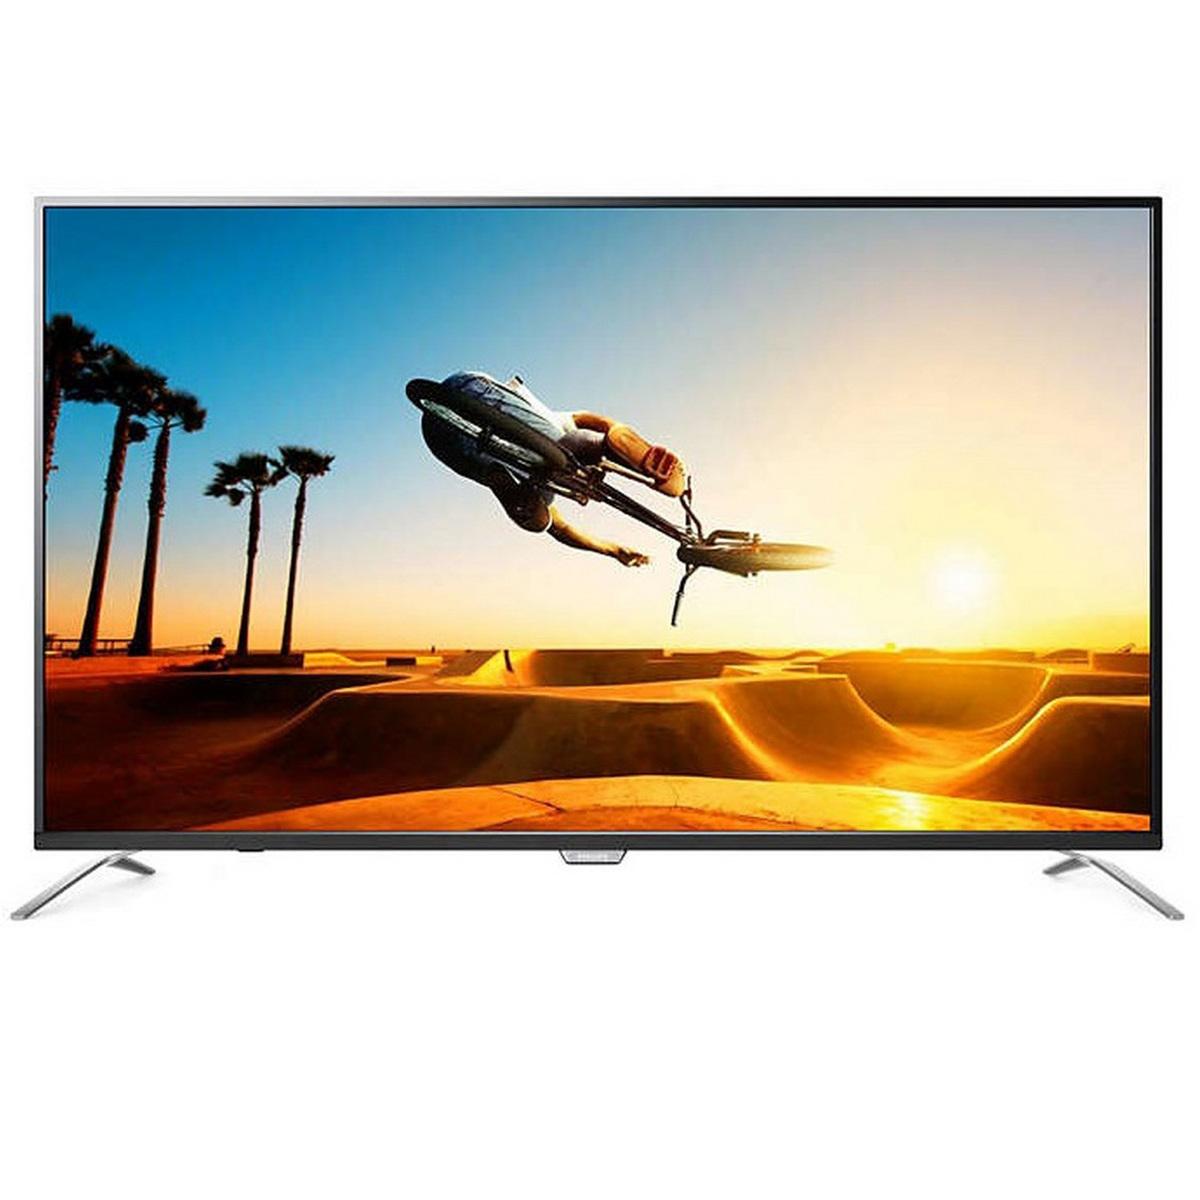 Buy Philips Ultra HD Smart LED TV 55PUT7032 55inch - 44